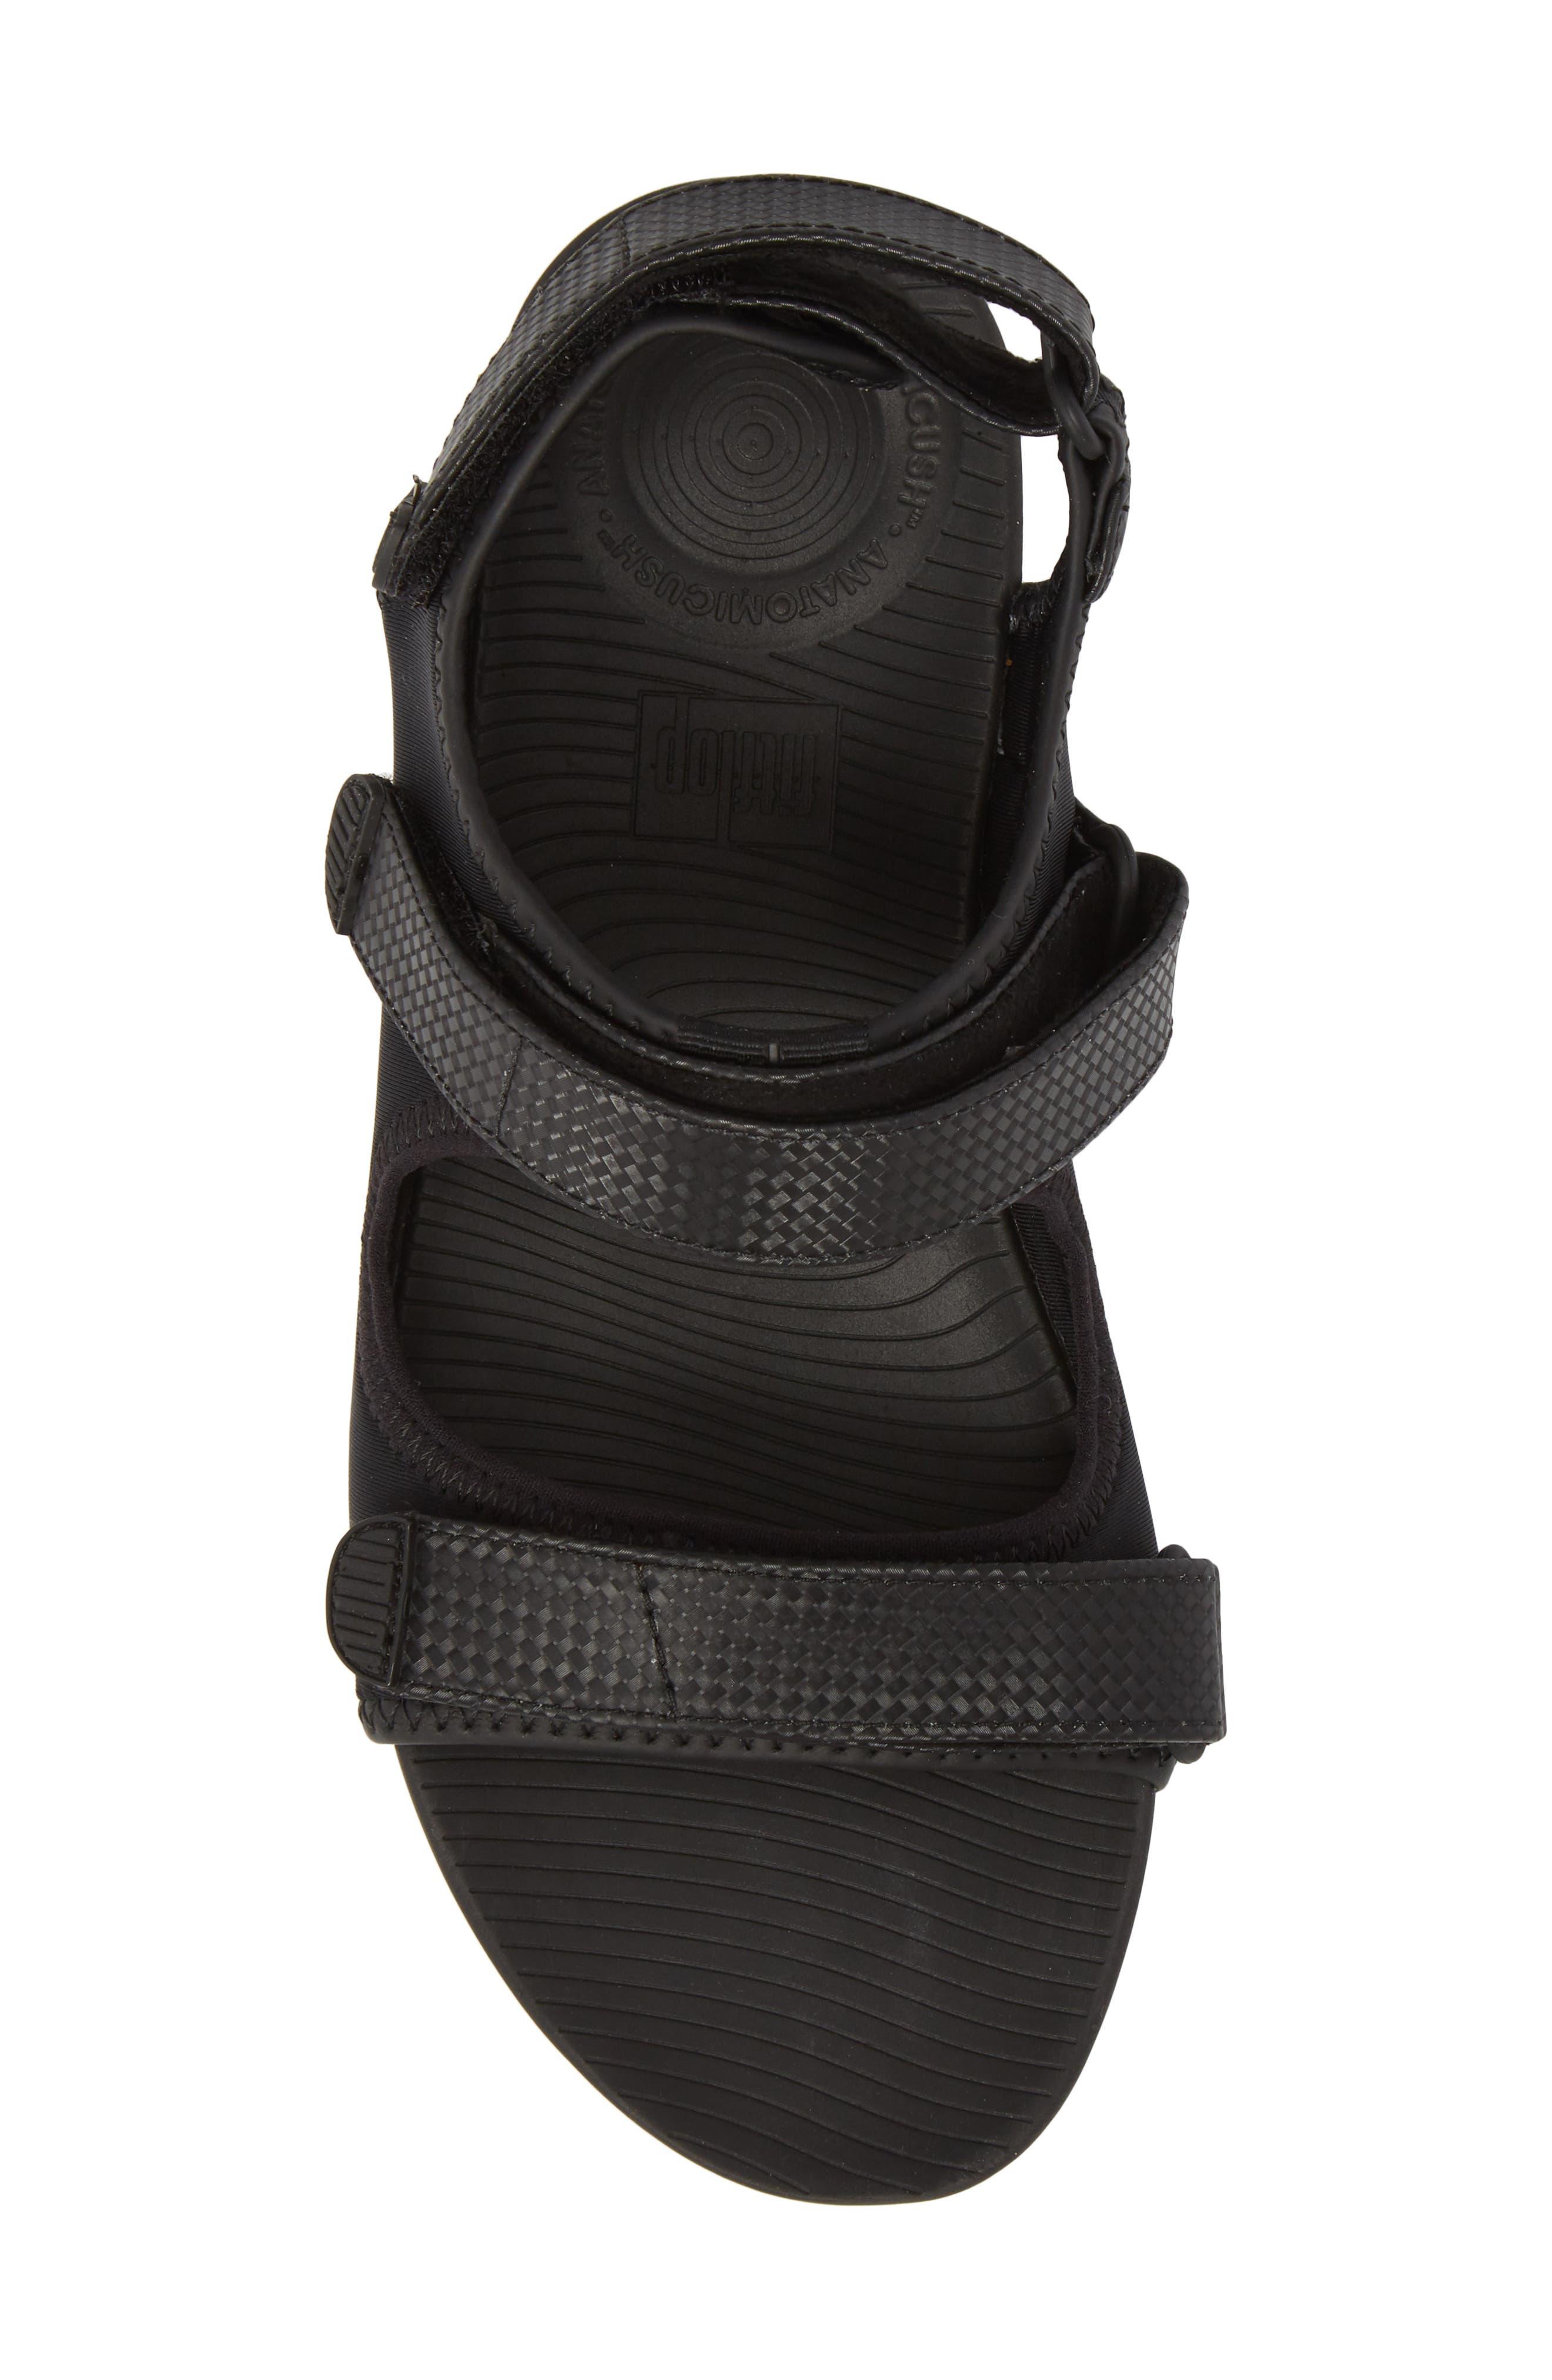 FitfFlop Neoflex<sup>™</sup> Back Strap Sandal,                             Alternate thumbnail 5, color,                             Black Leather